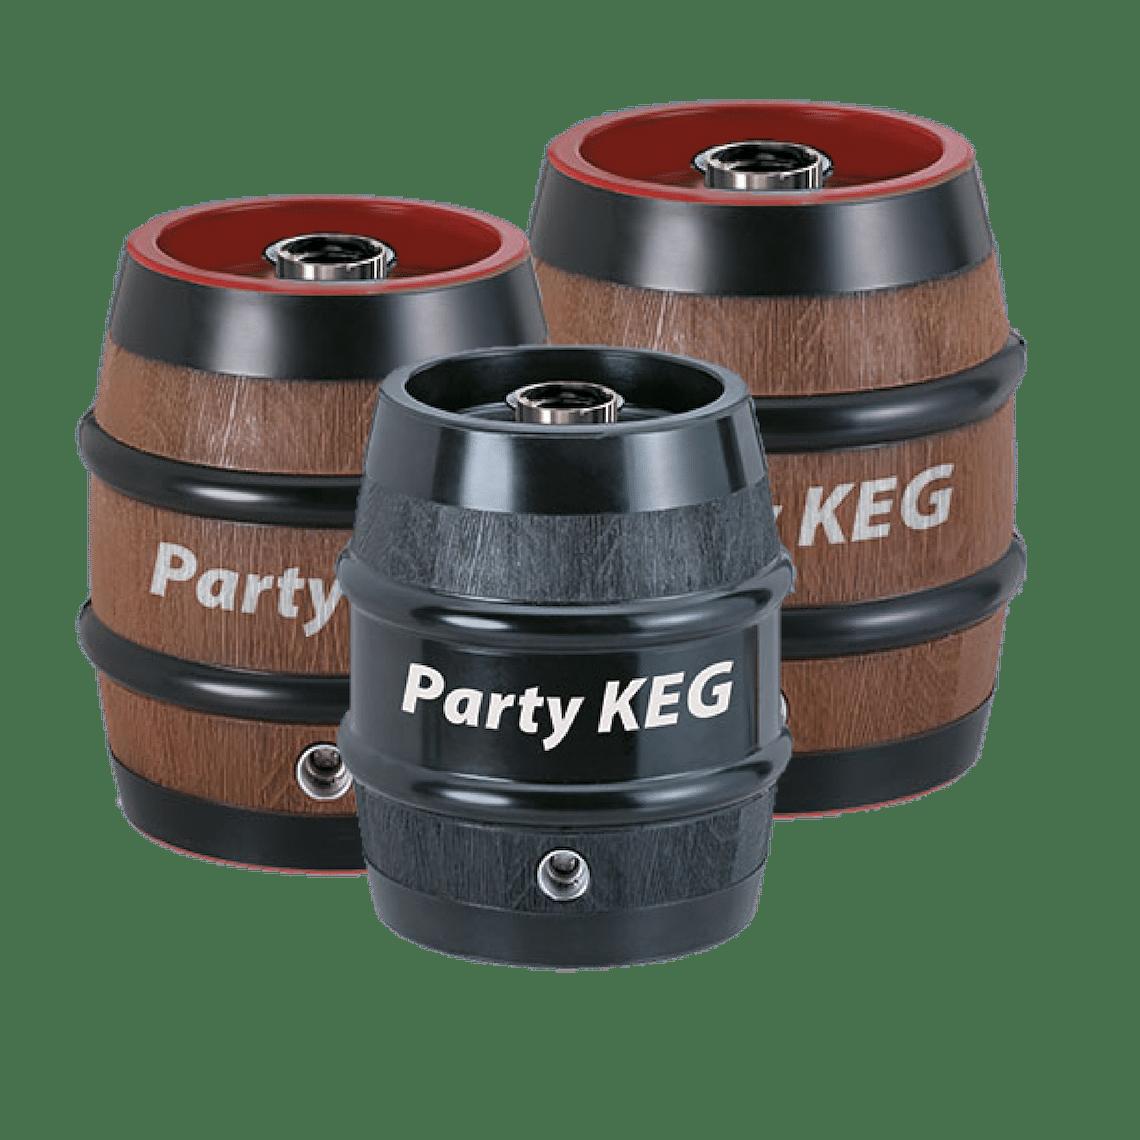 Party Keg Schaefer Party Kegs